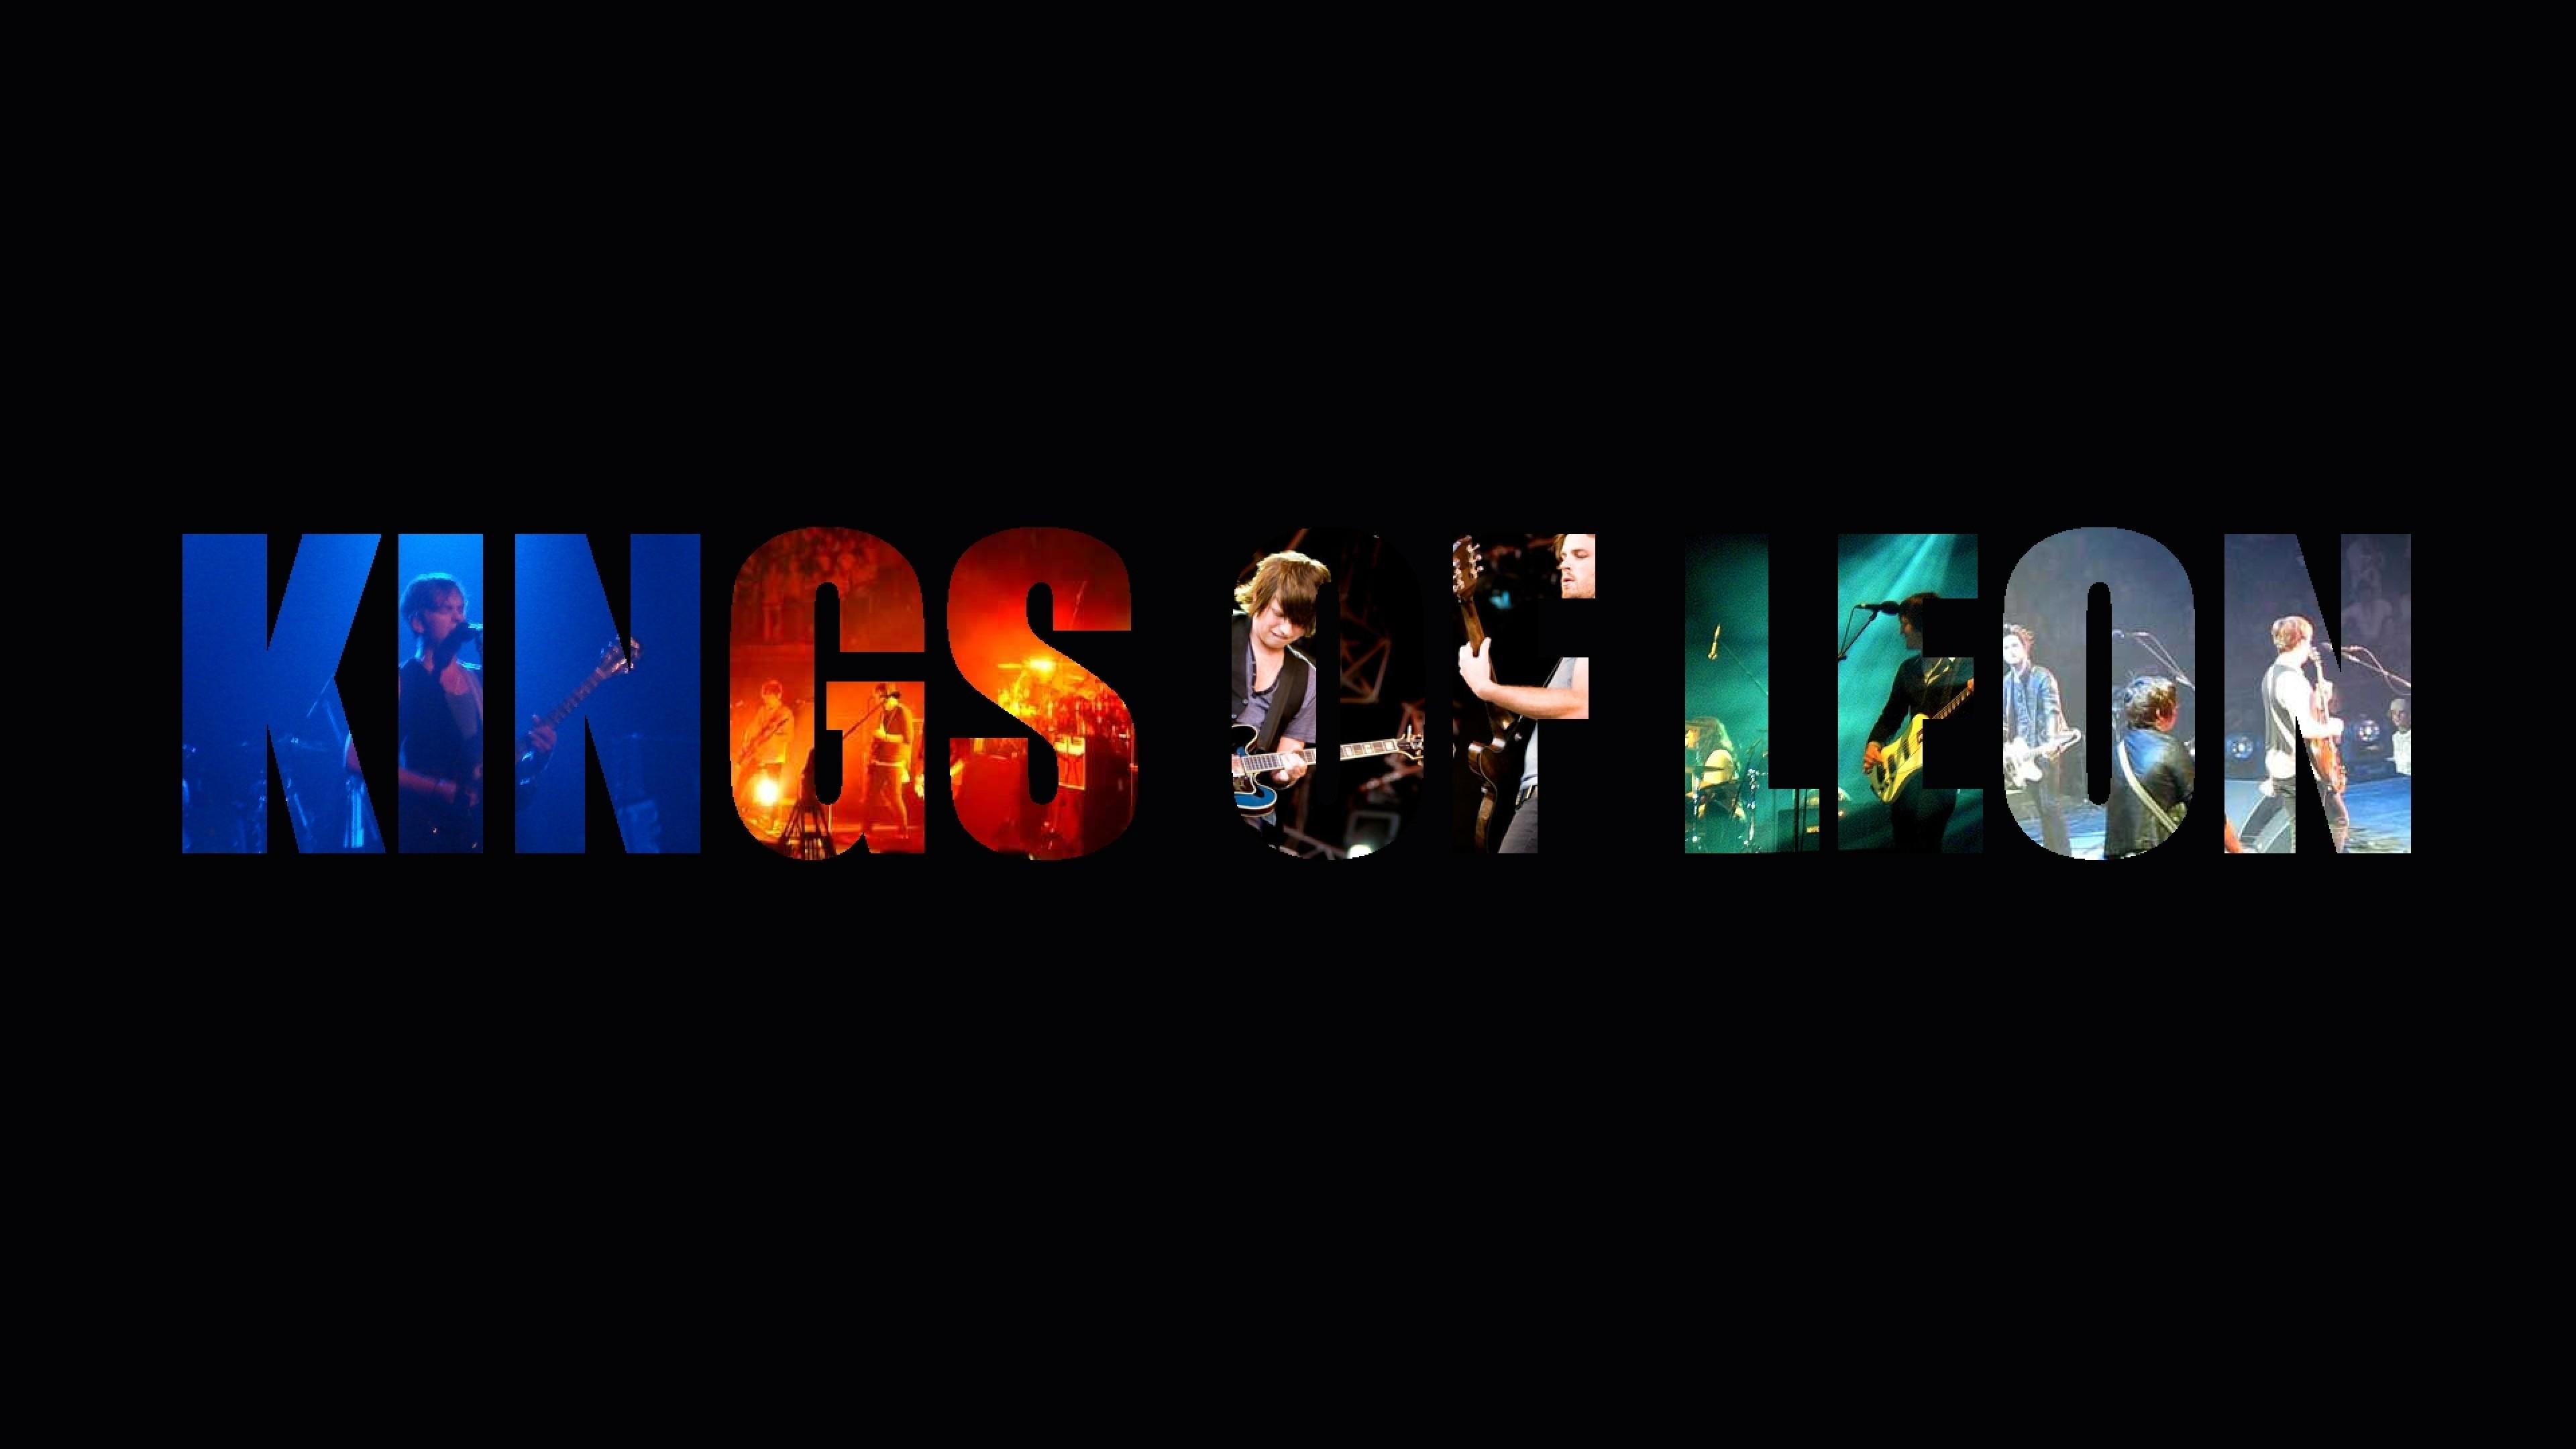 Wallpaper kings of leon, letters, action, concert, members